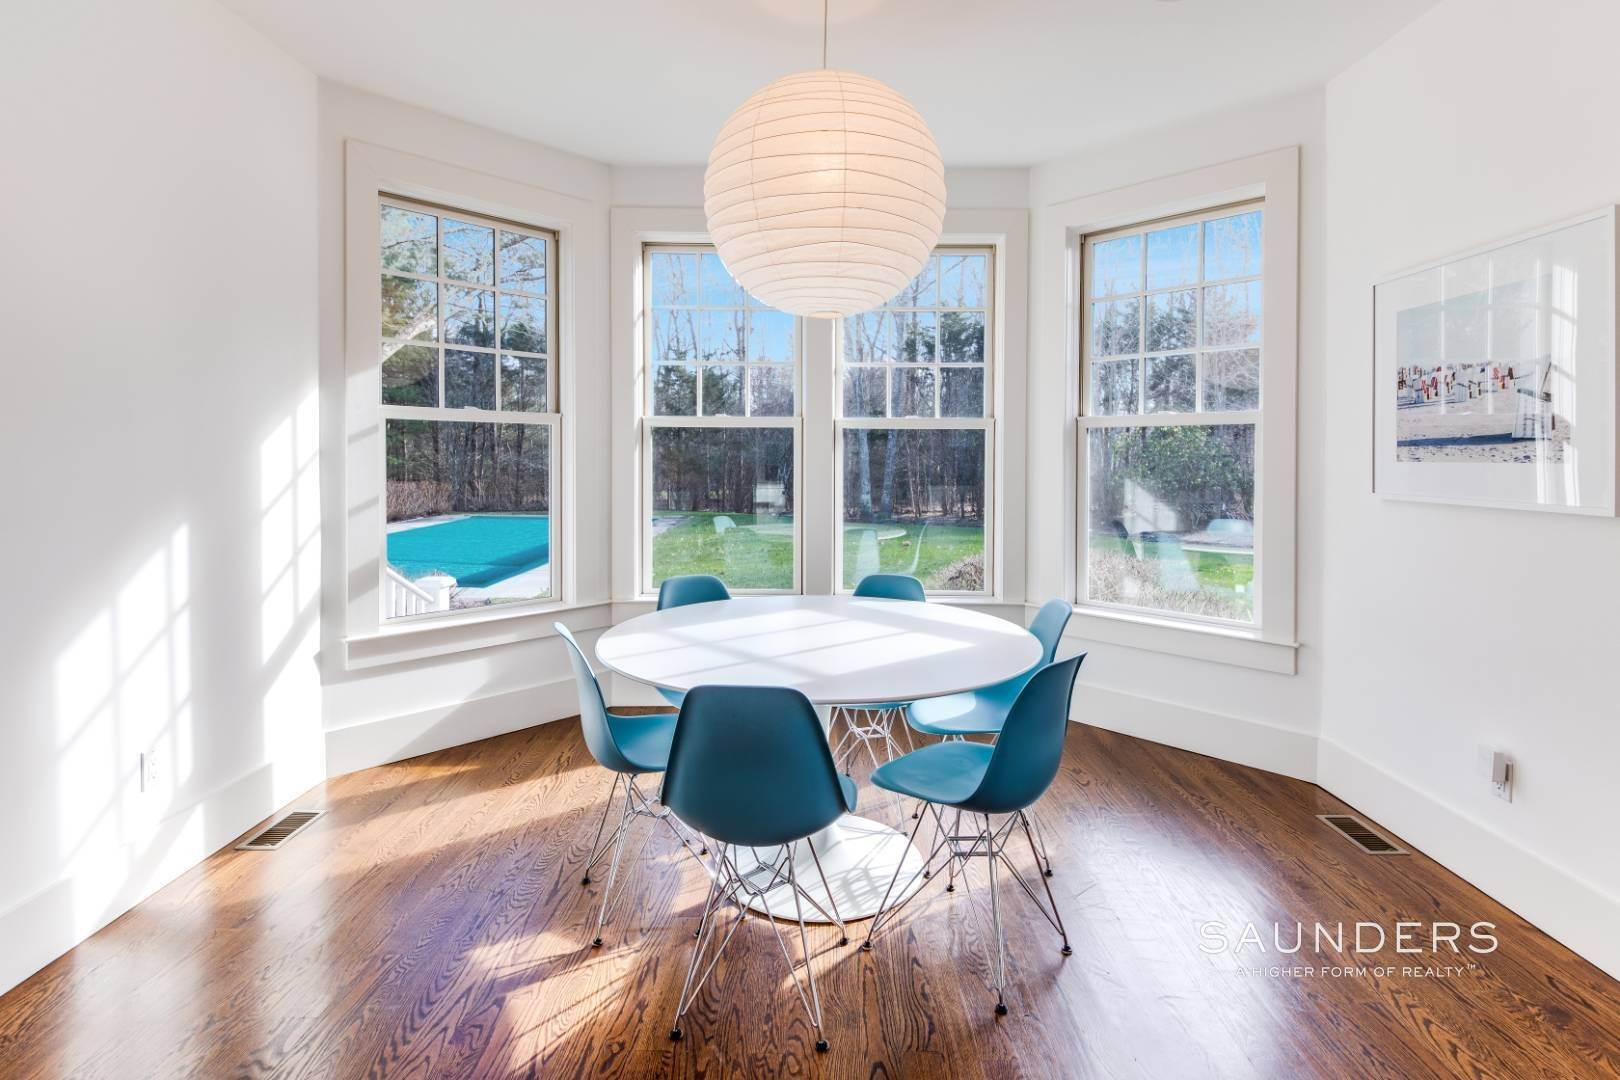 8. Single Family Homes for Sale at Wainscott South Traditional Near Beach Lane 10 Merriwood Drive, Wainscott, East Hampton Town, NY 11975